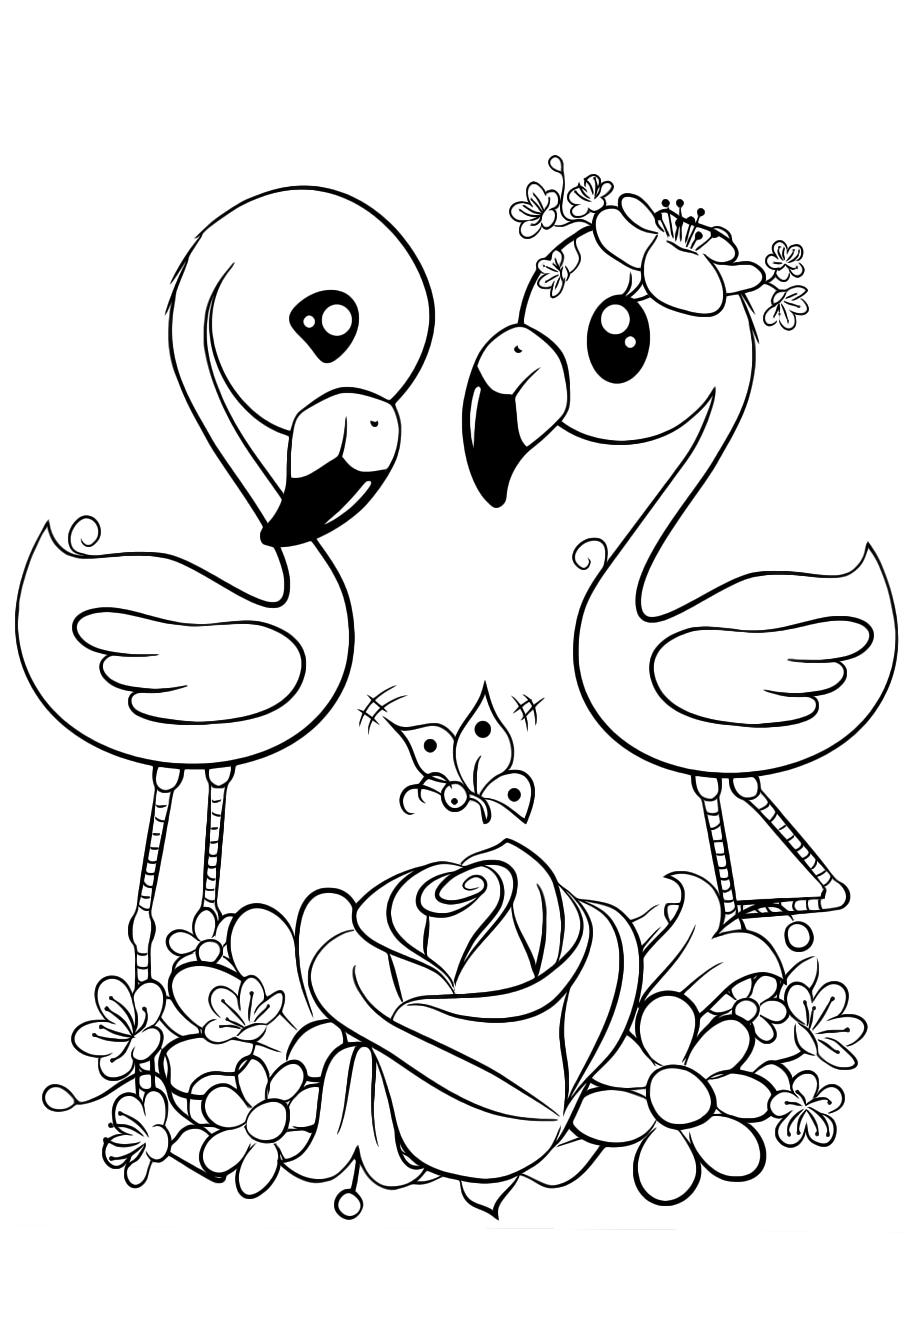 Милашки Фламинго - Милашки - Раскраски антистресс